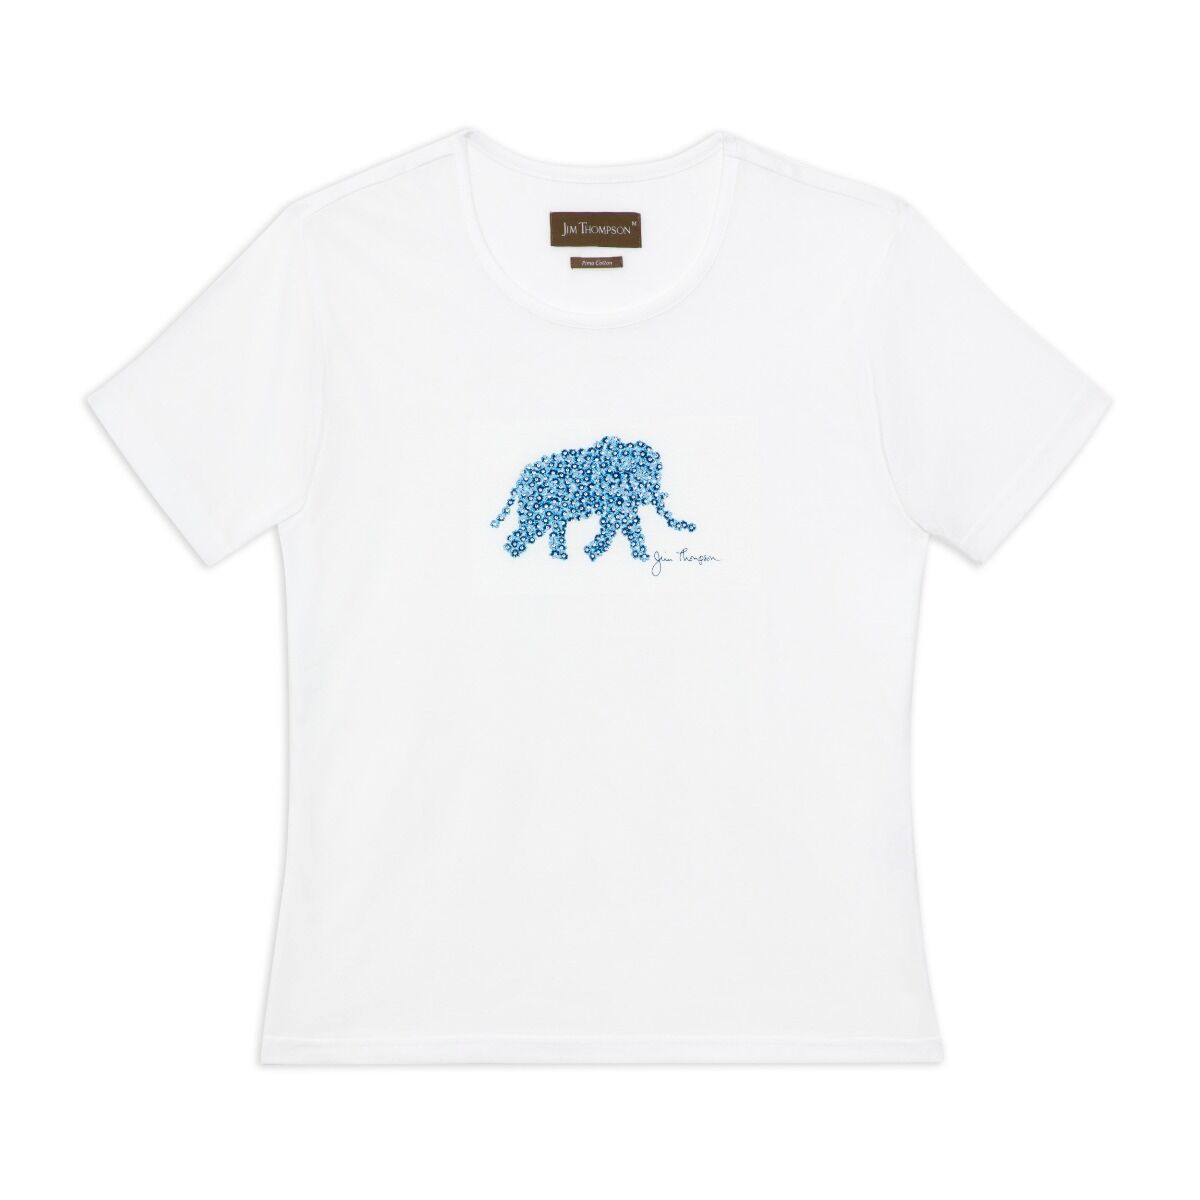 Crystal Floral Elephant Cotton T-shirt - White/Blue